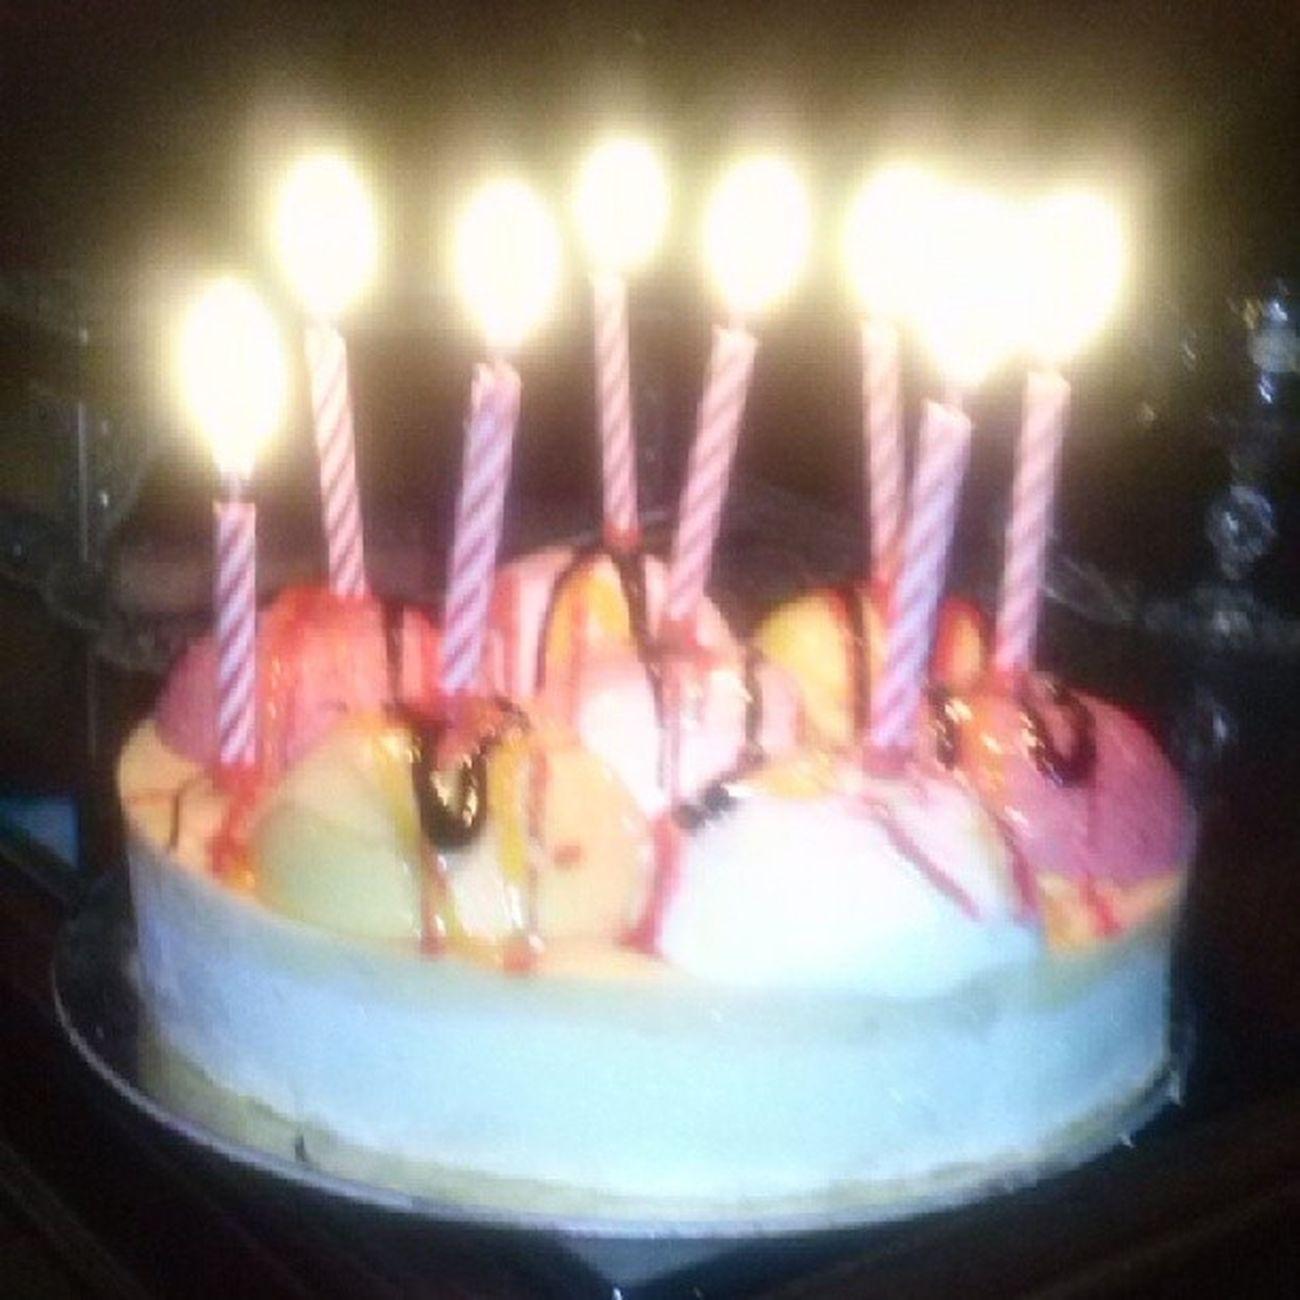 Kona bnhtfel Hahhaha Icecream cake Yumy